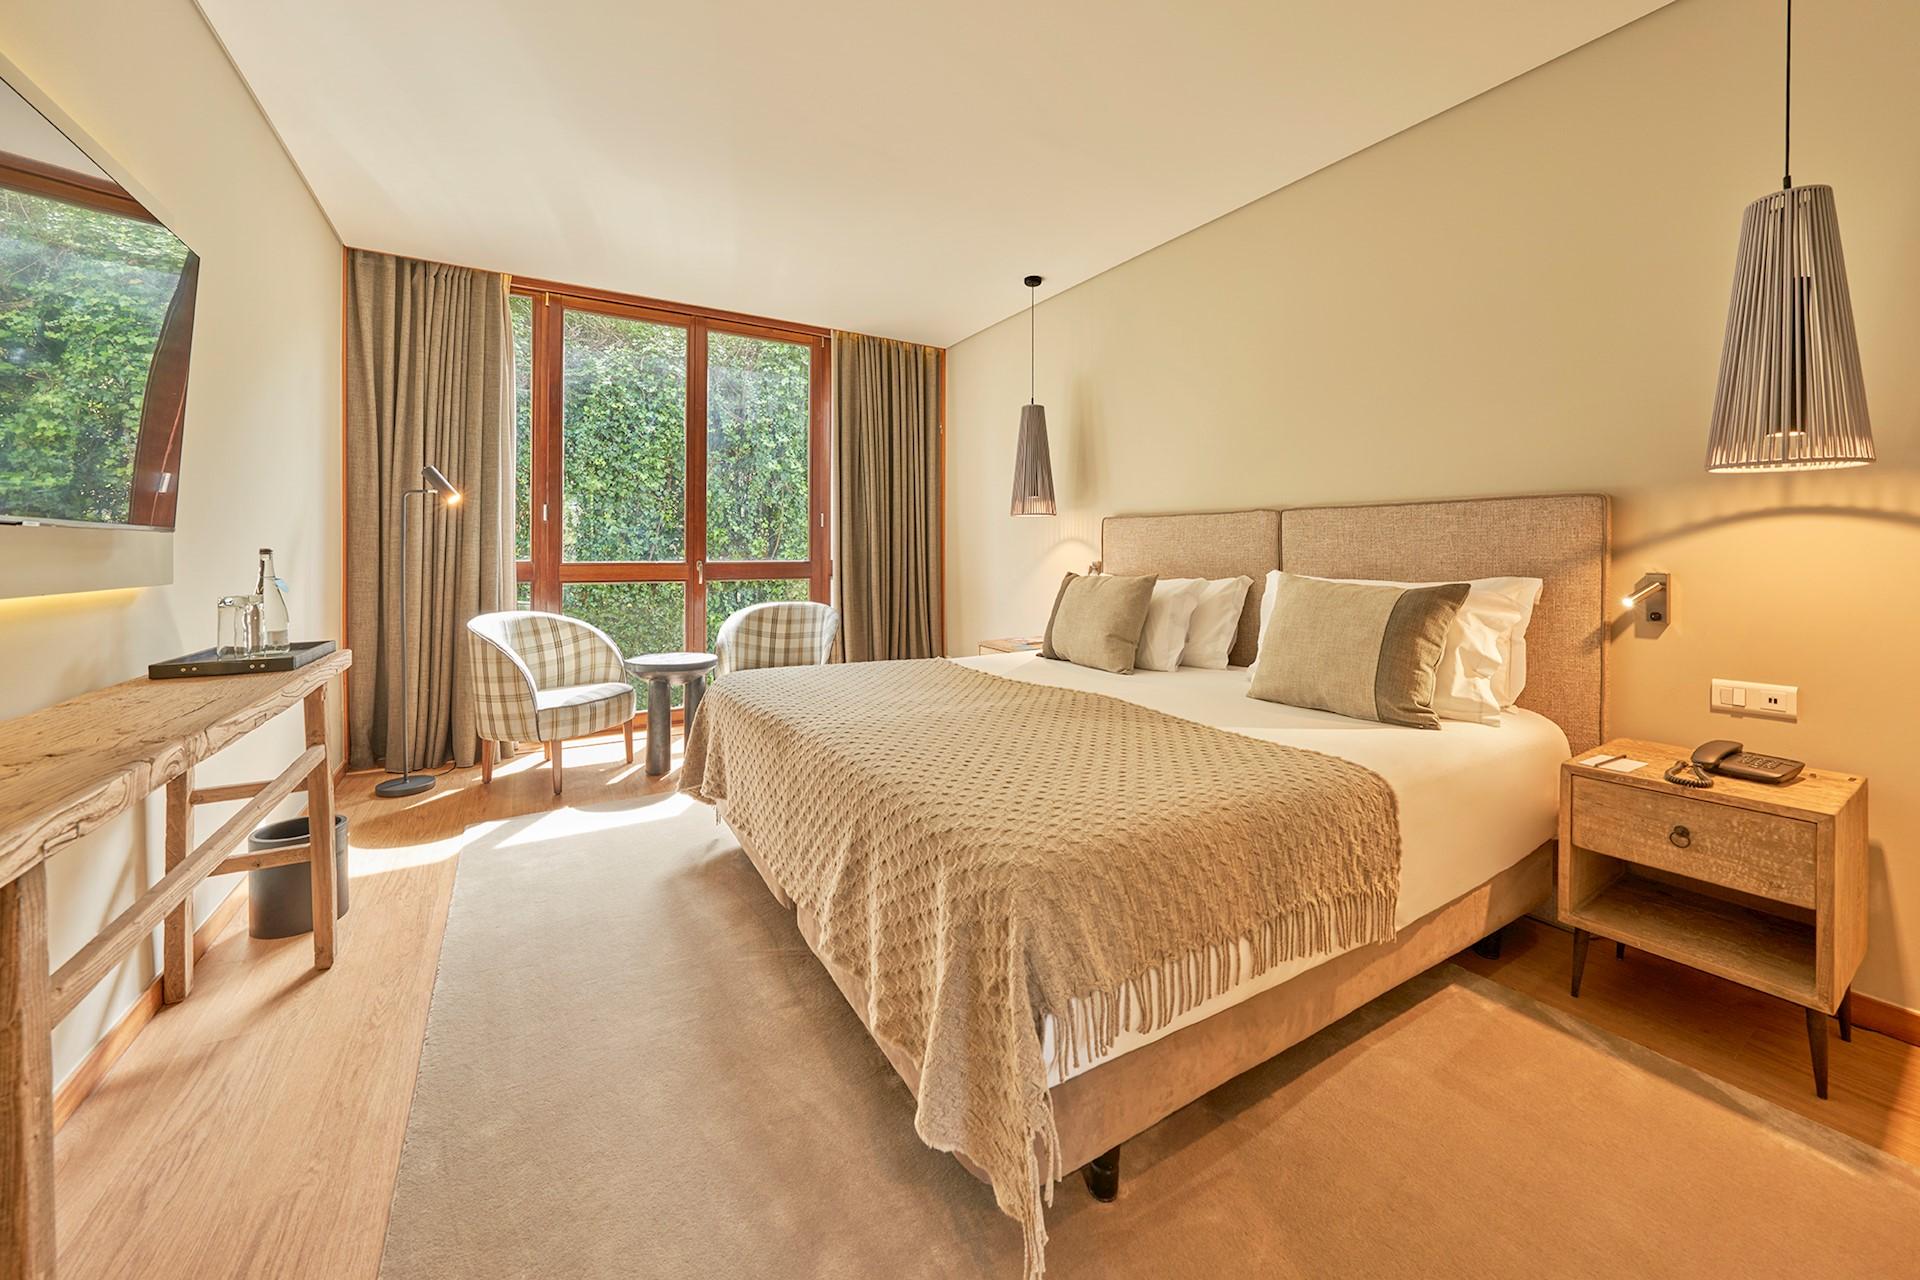 Hotel PortoBay Serra Golf - Madeira Island - Standard Room